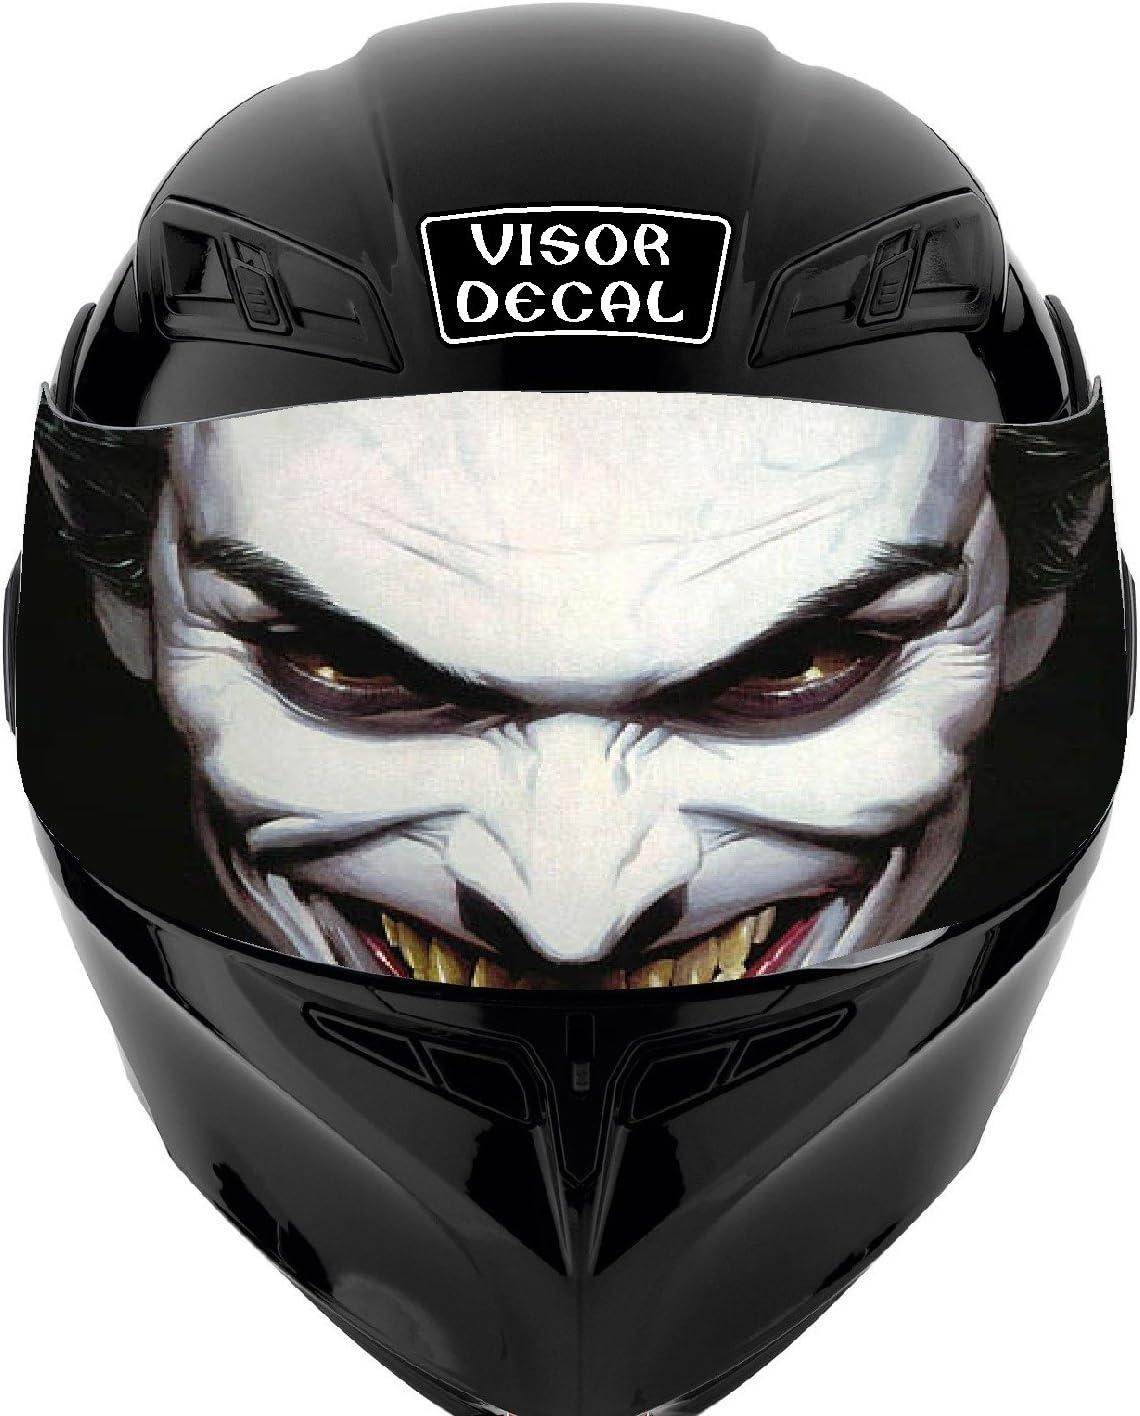 Under blast sales V16 Joker VISOR TINT DECAL Graphic Direct sale of manufacturer Helmet Sticker Fits: Icon Sho